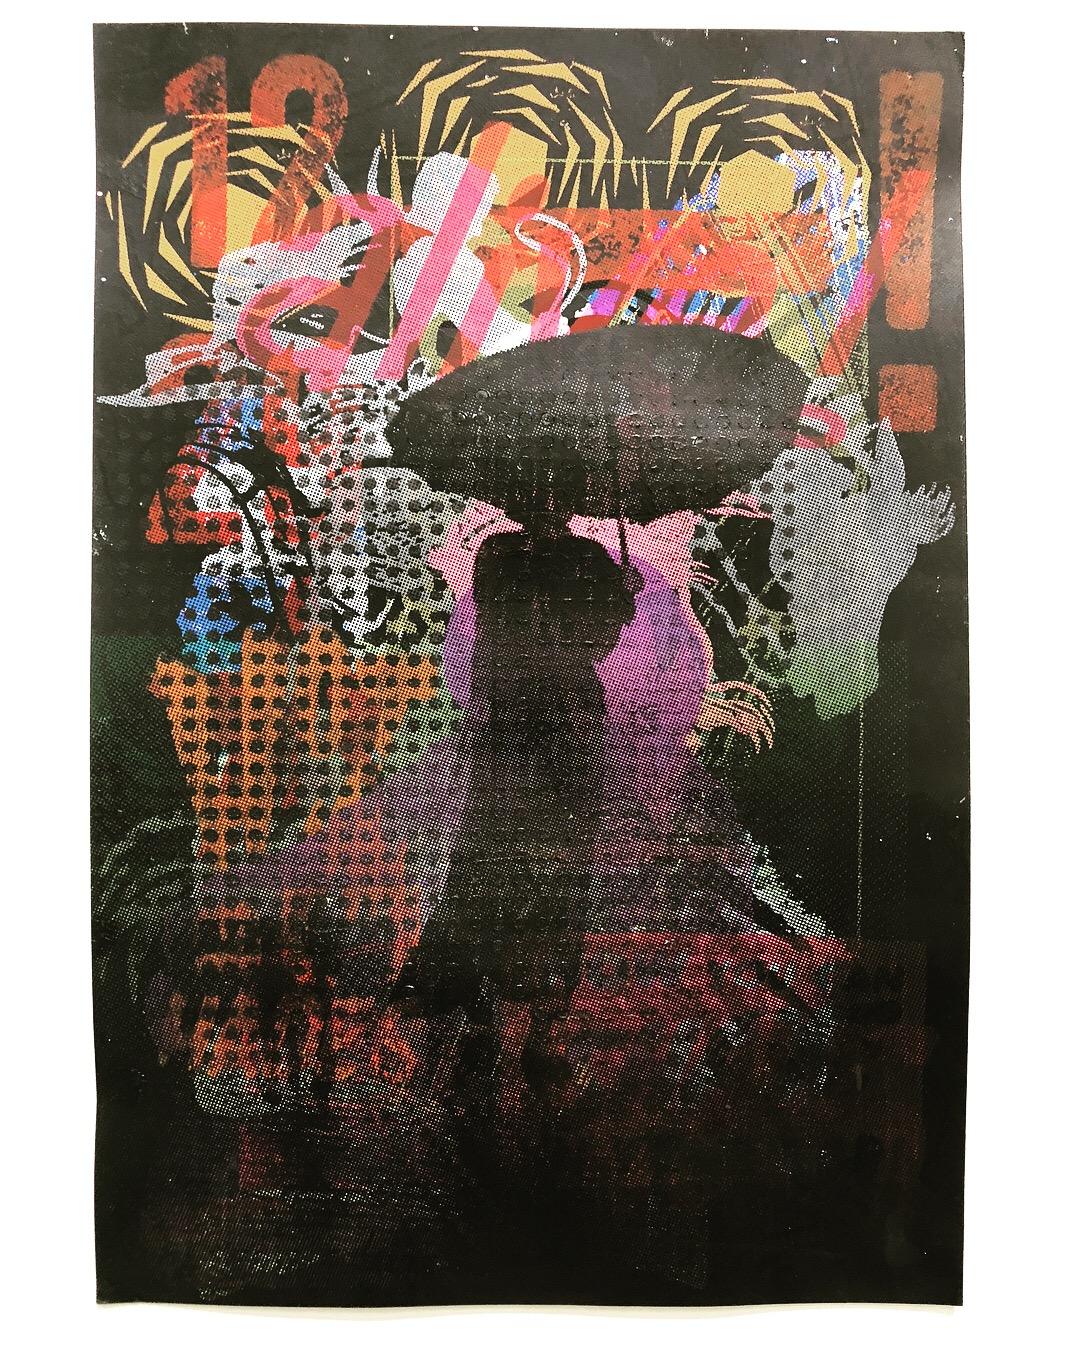 1_Kevin_Abeyta_C-Beams Glitter_Austin Art_Austin Artist_Austin Gifts.JPG